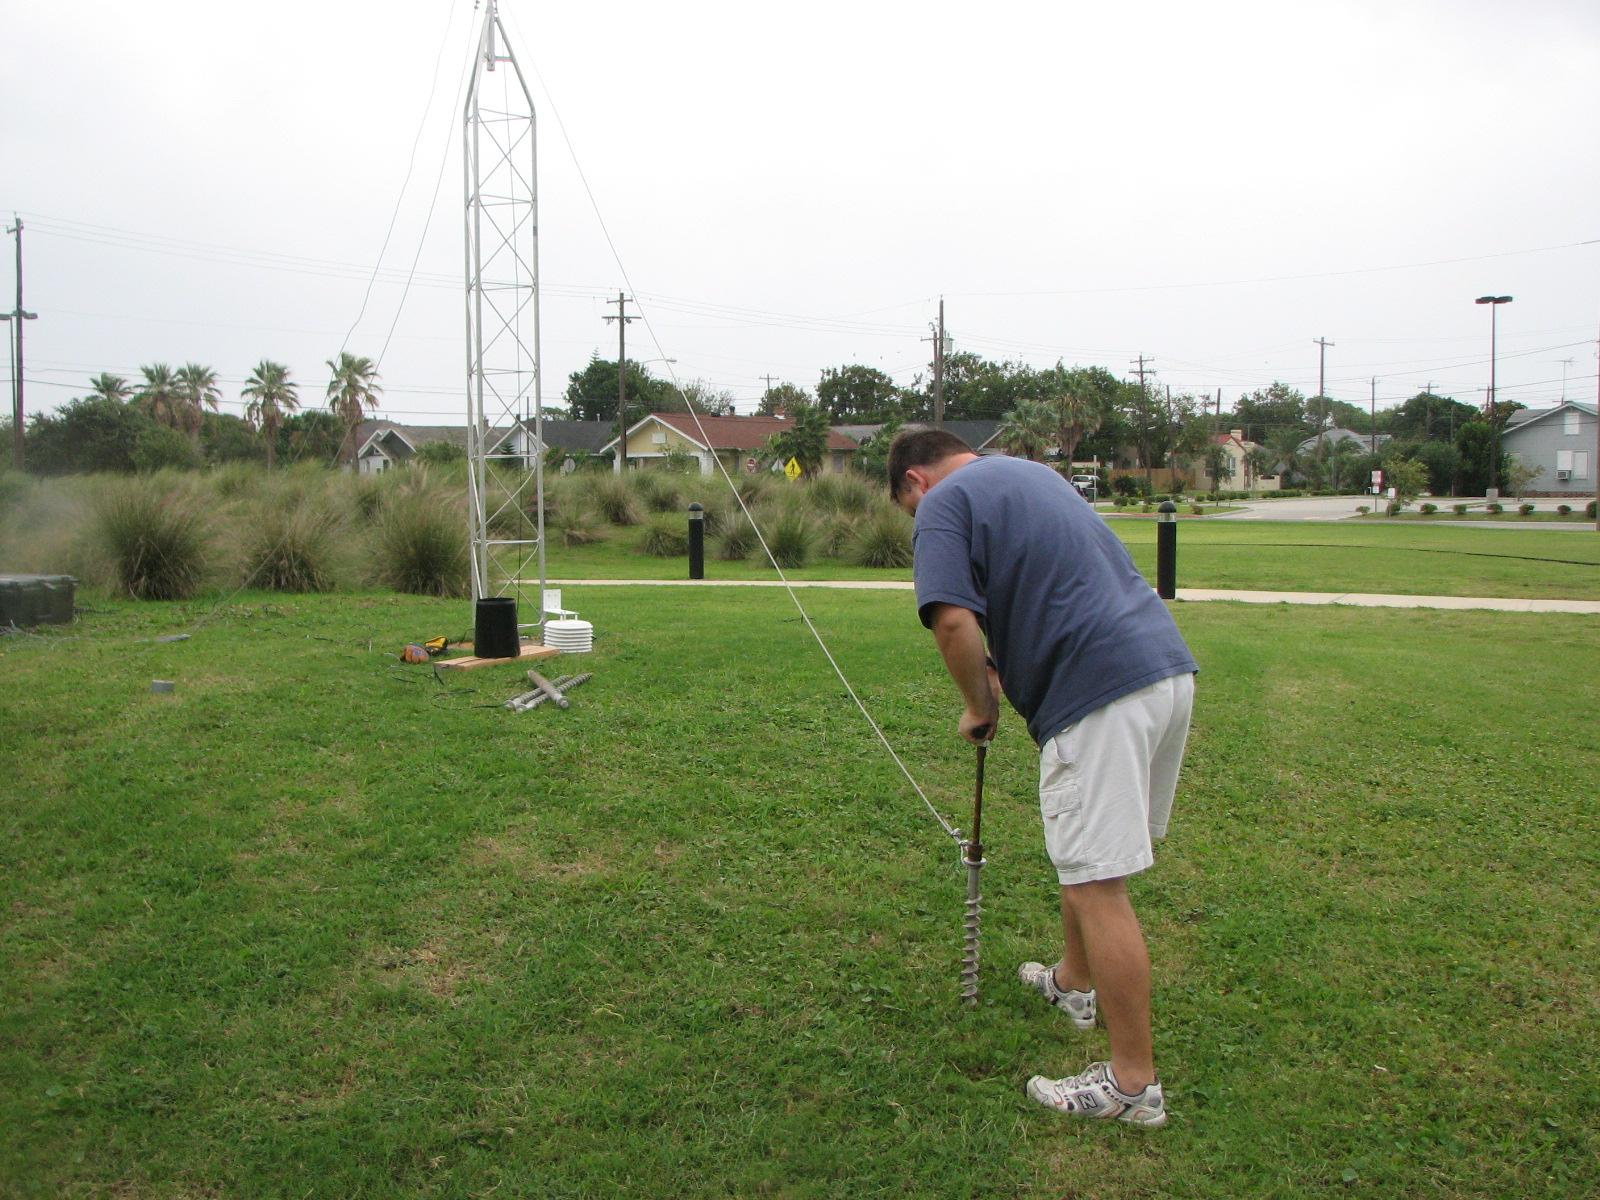 Installing three 18-inch Penetrators to secure hurricane tracker